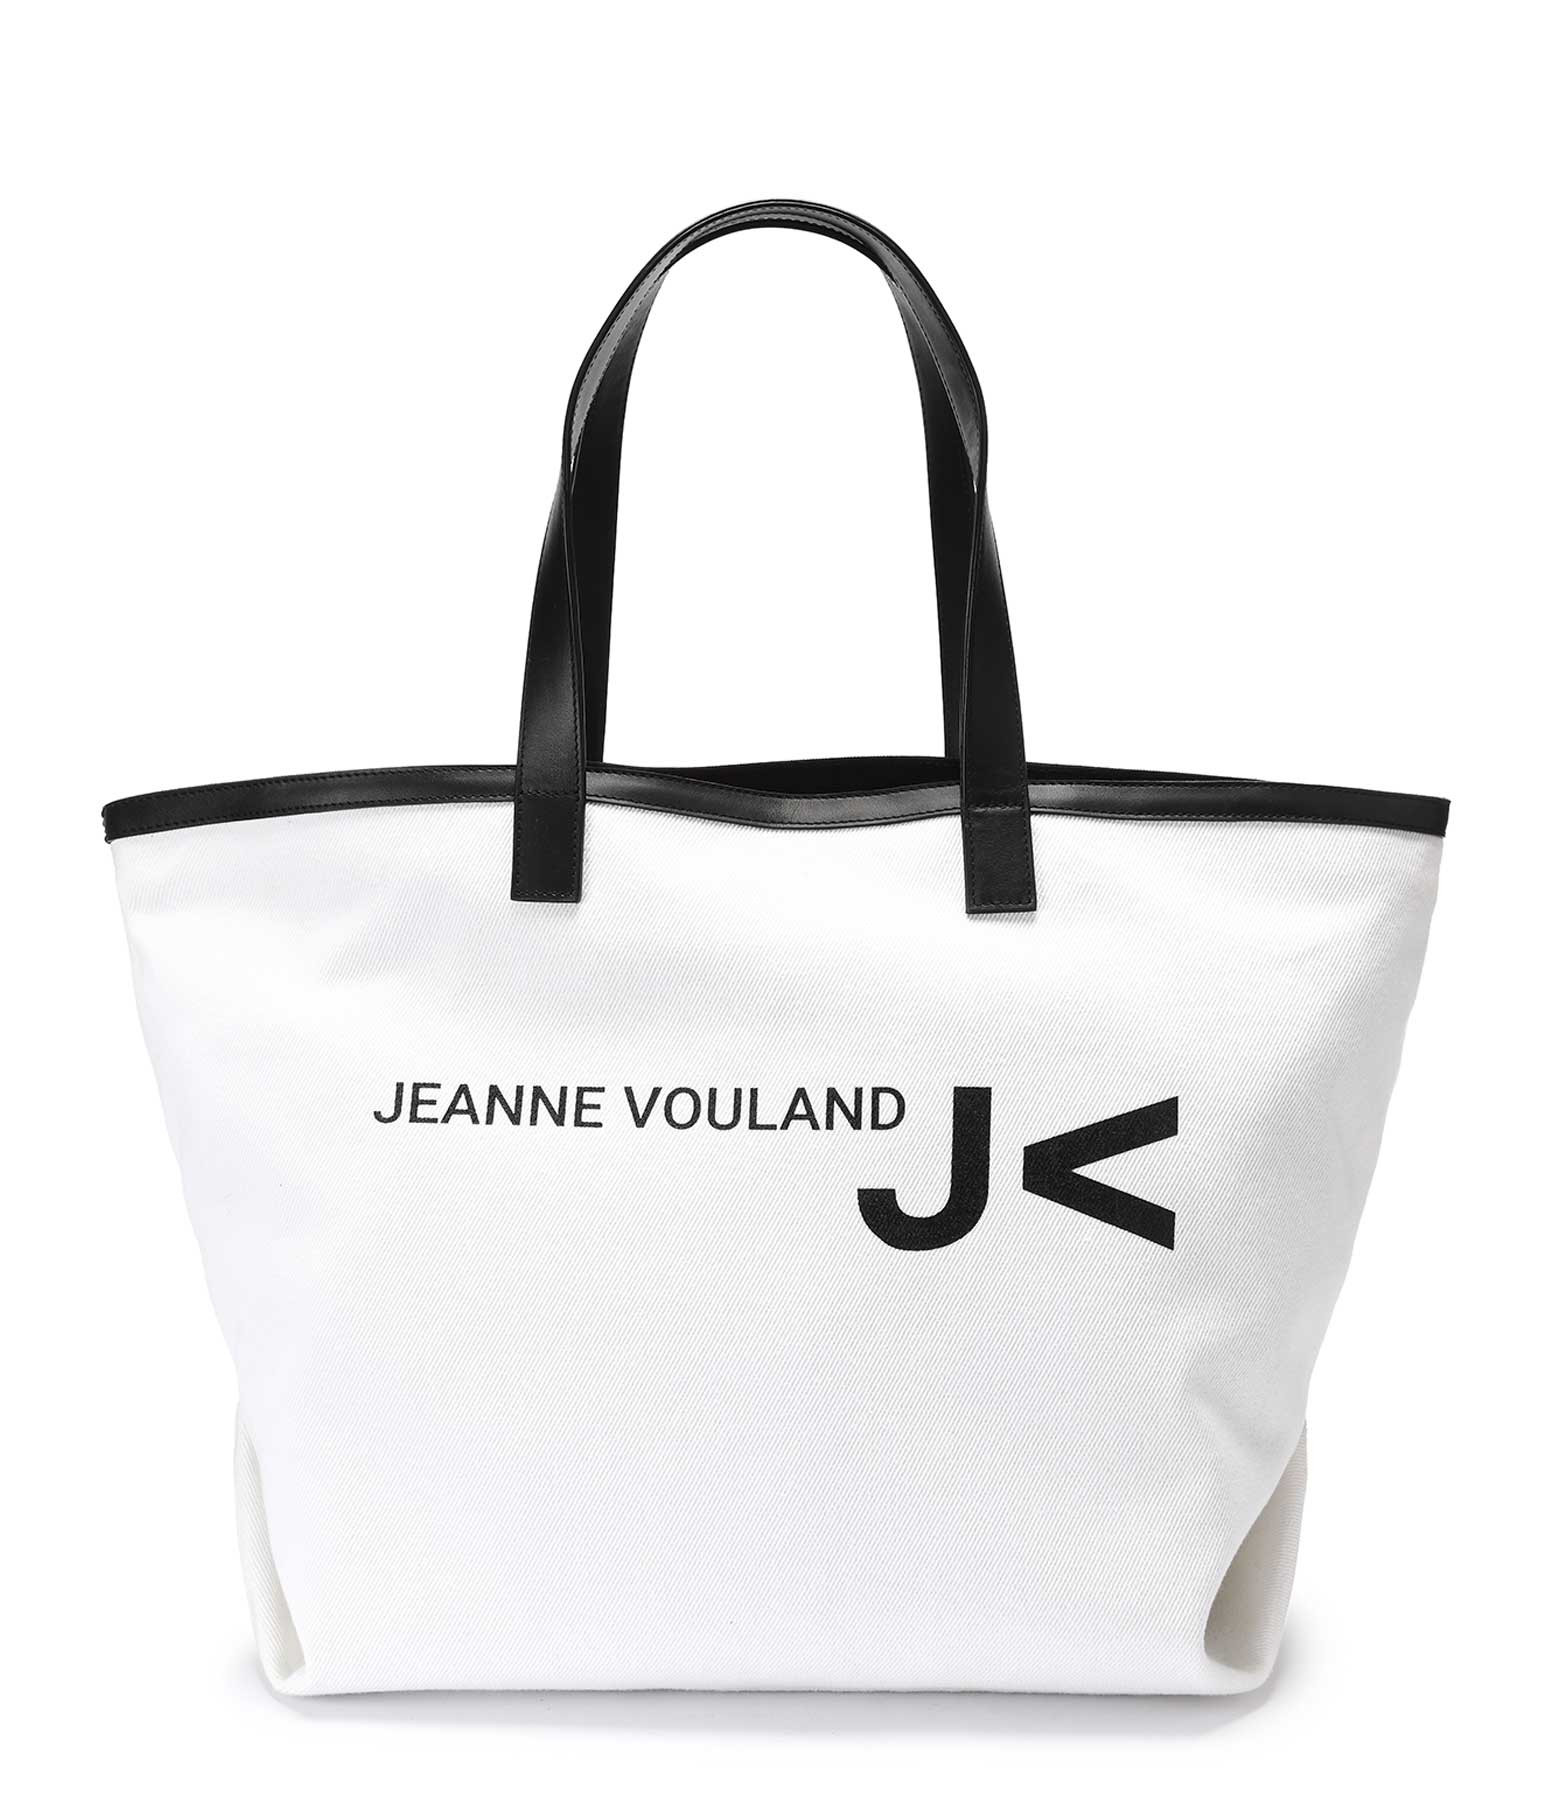 JEANNE VOULAND - Cabas Toile Sergé Cely Blanc